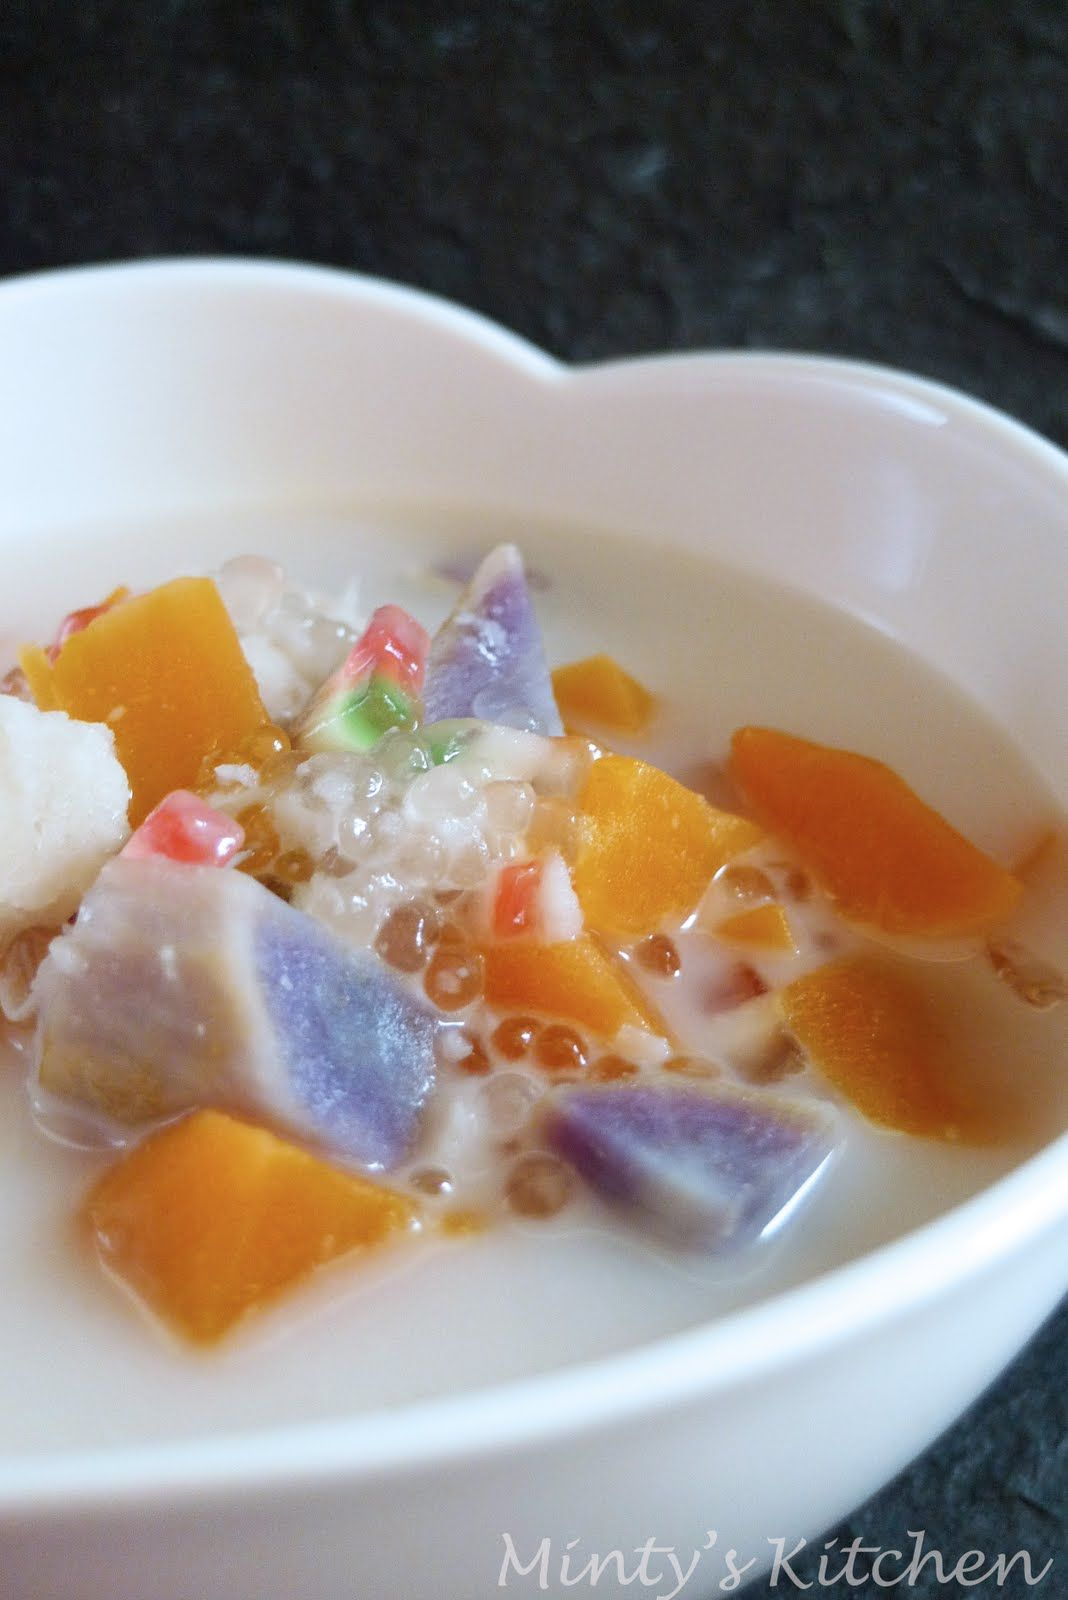 Minty S Kitchen Bubur Cha Cha Asian Desserts Cha Recipe Food